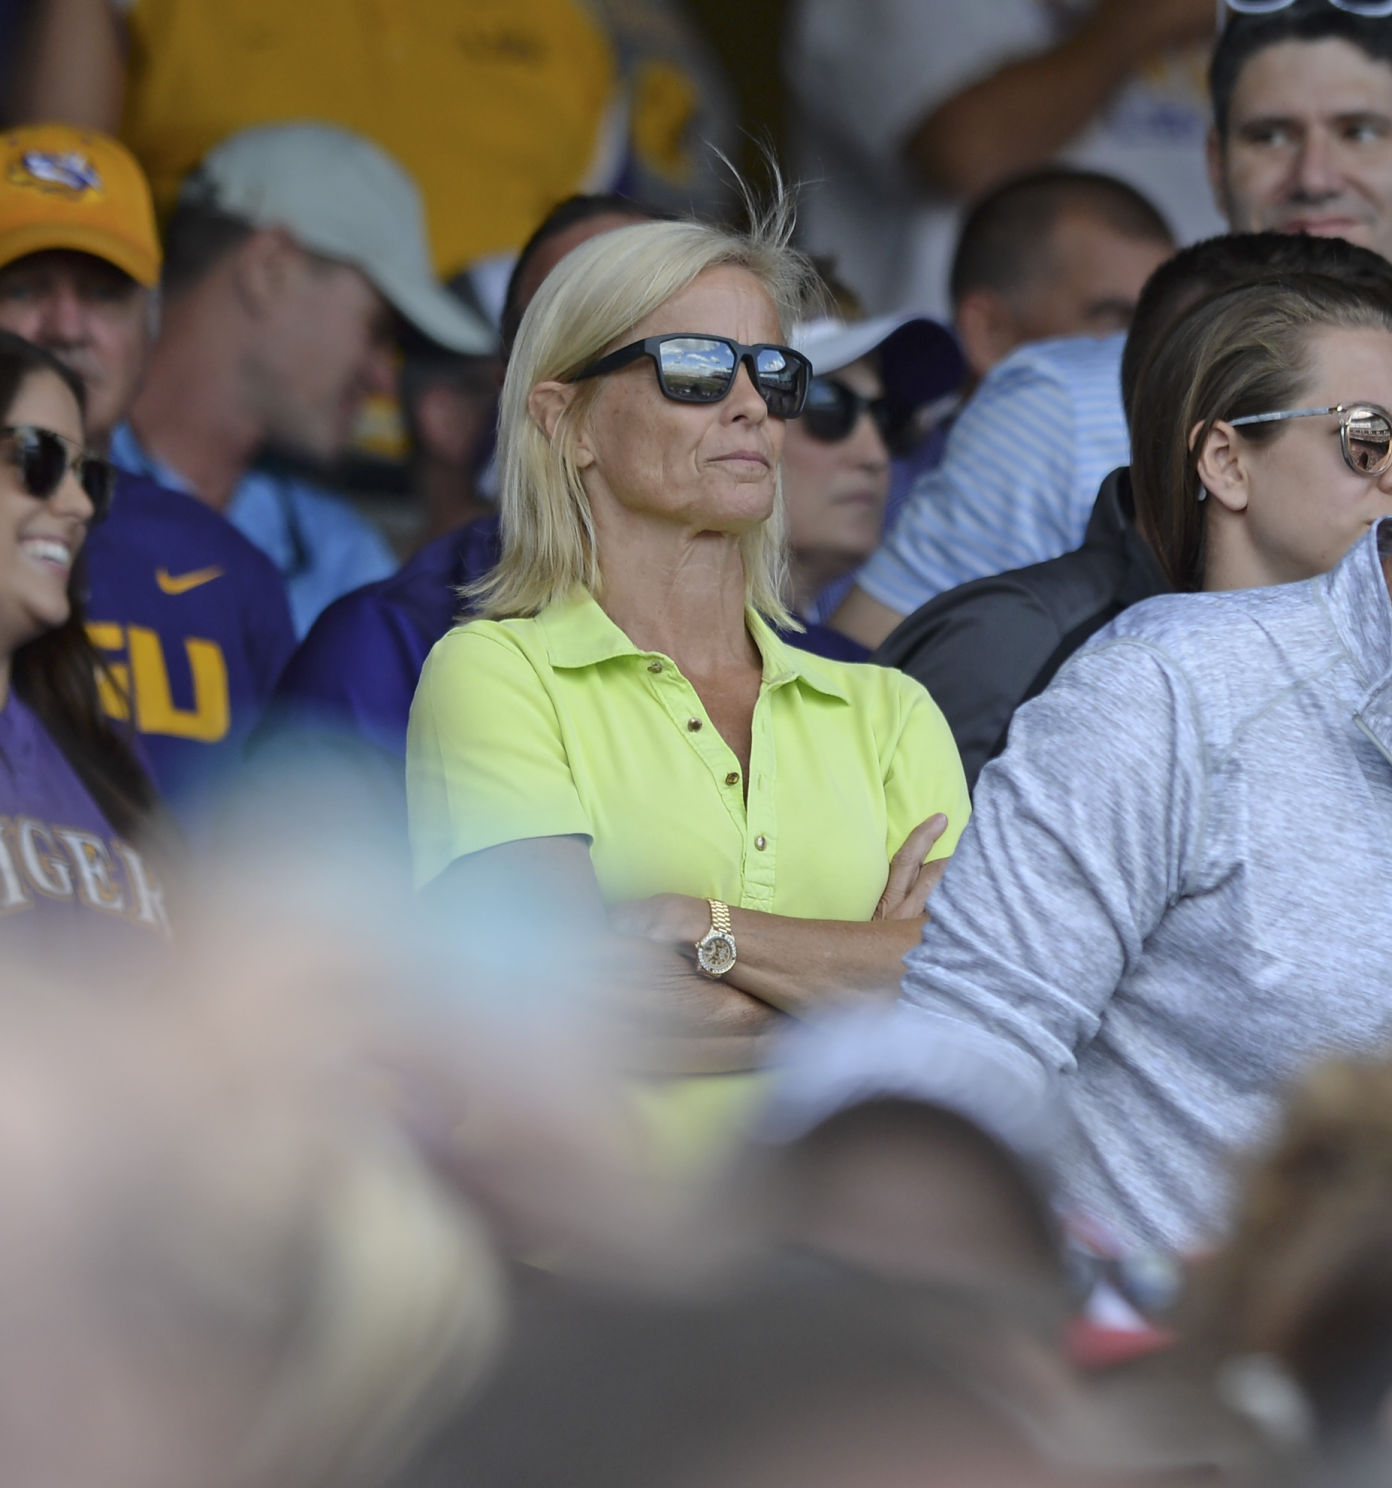 Kramer Robertson S Mom And Baylor Women S Basketball Coach Kim Mulkey On Life Sports And Kramer S Hair Lsu Theadvocate Com